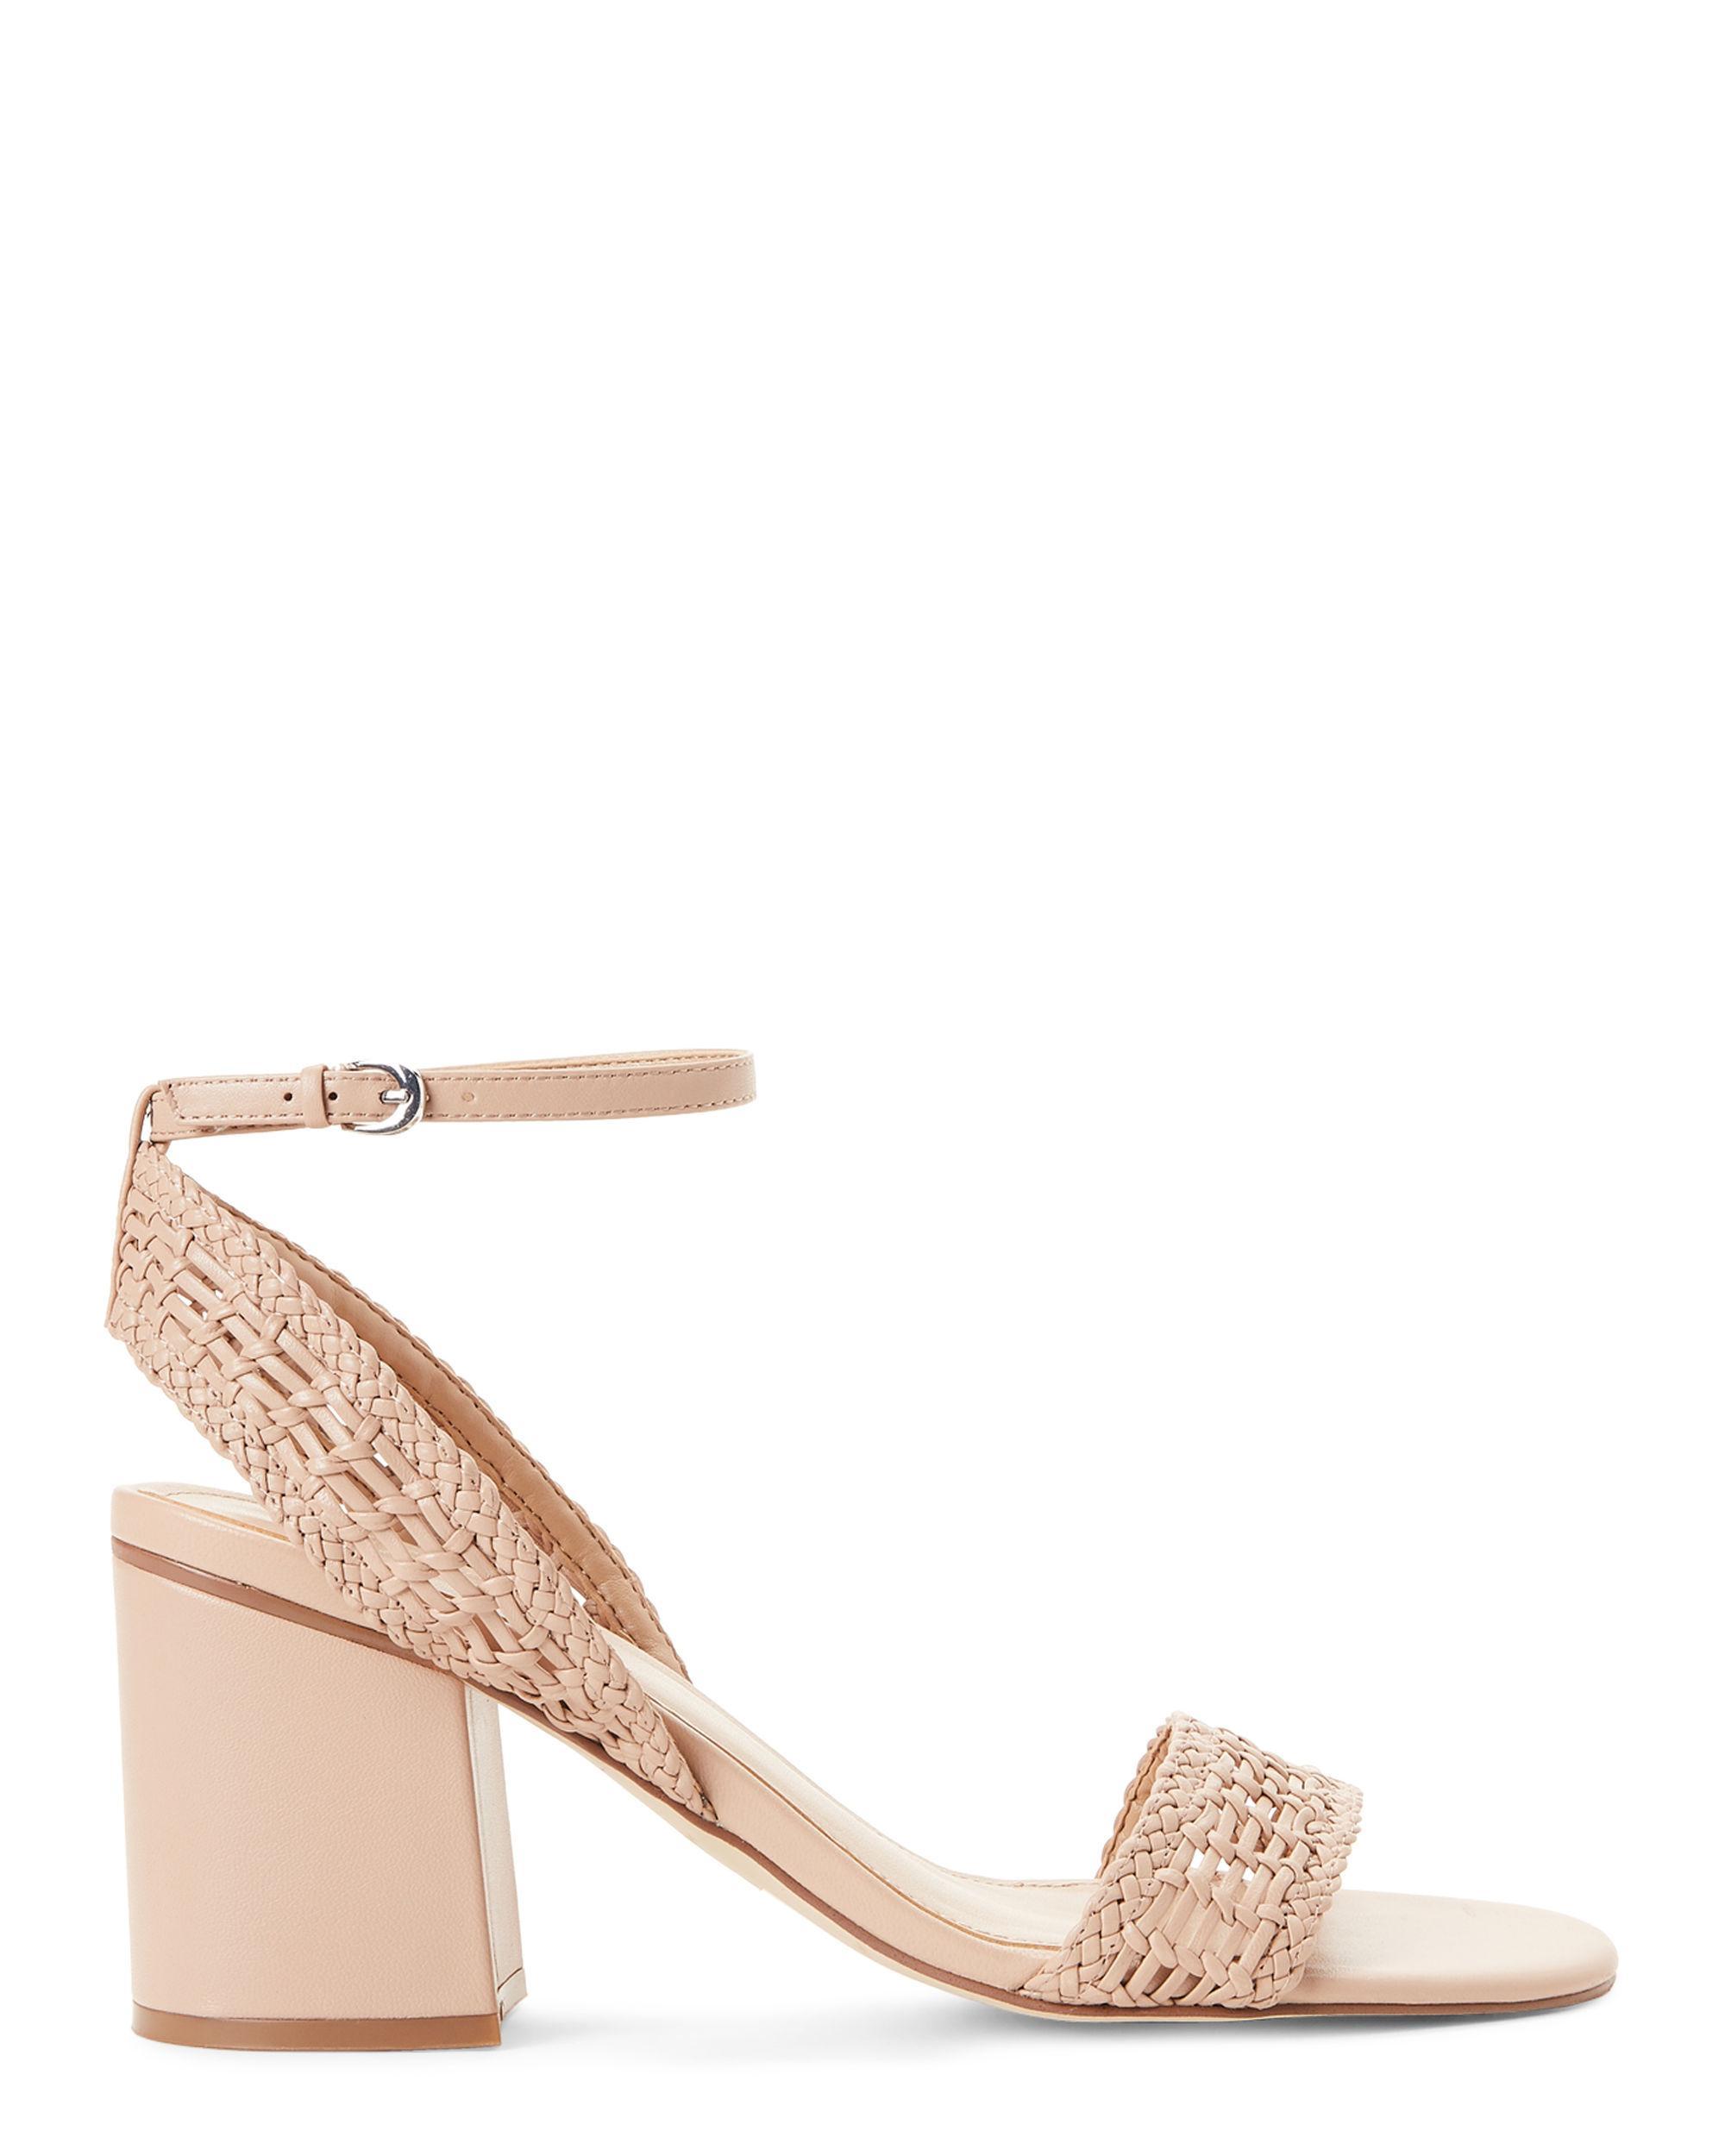 5618f4f3485 Marc Fisher - Multicolor Lite Latte Amere Leather Block Heel Sandals -  Lyst. View fullscreen